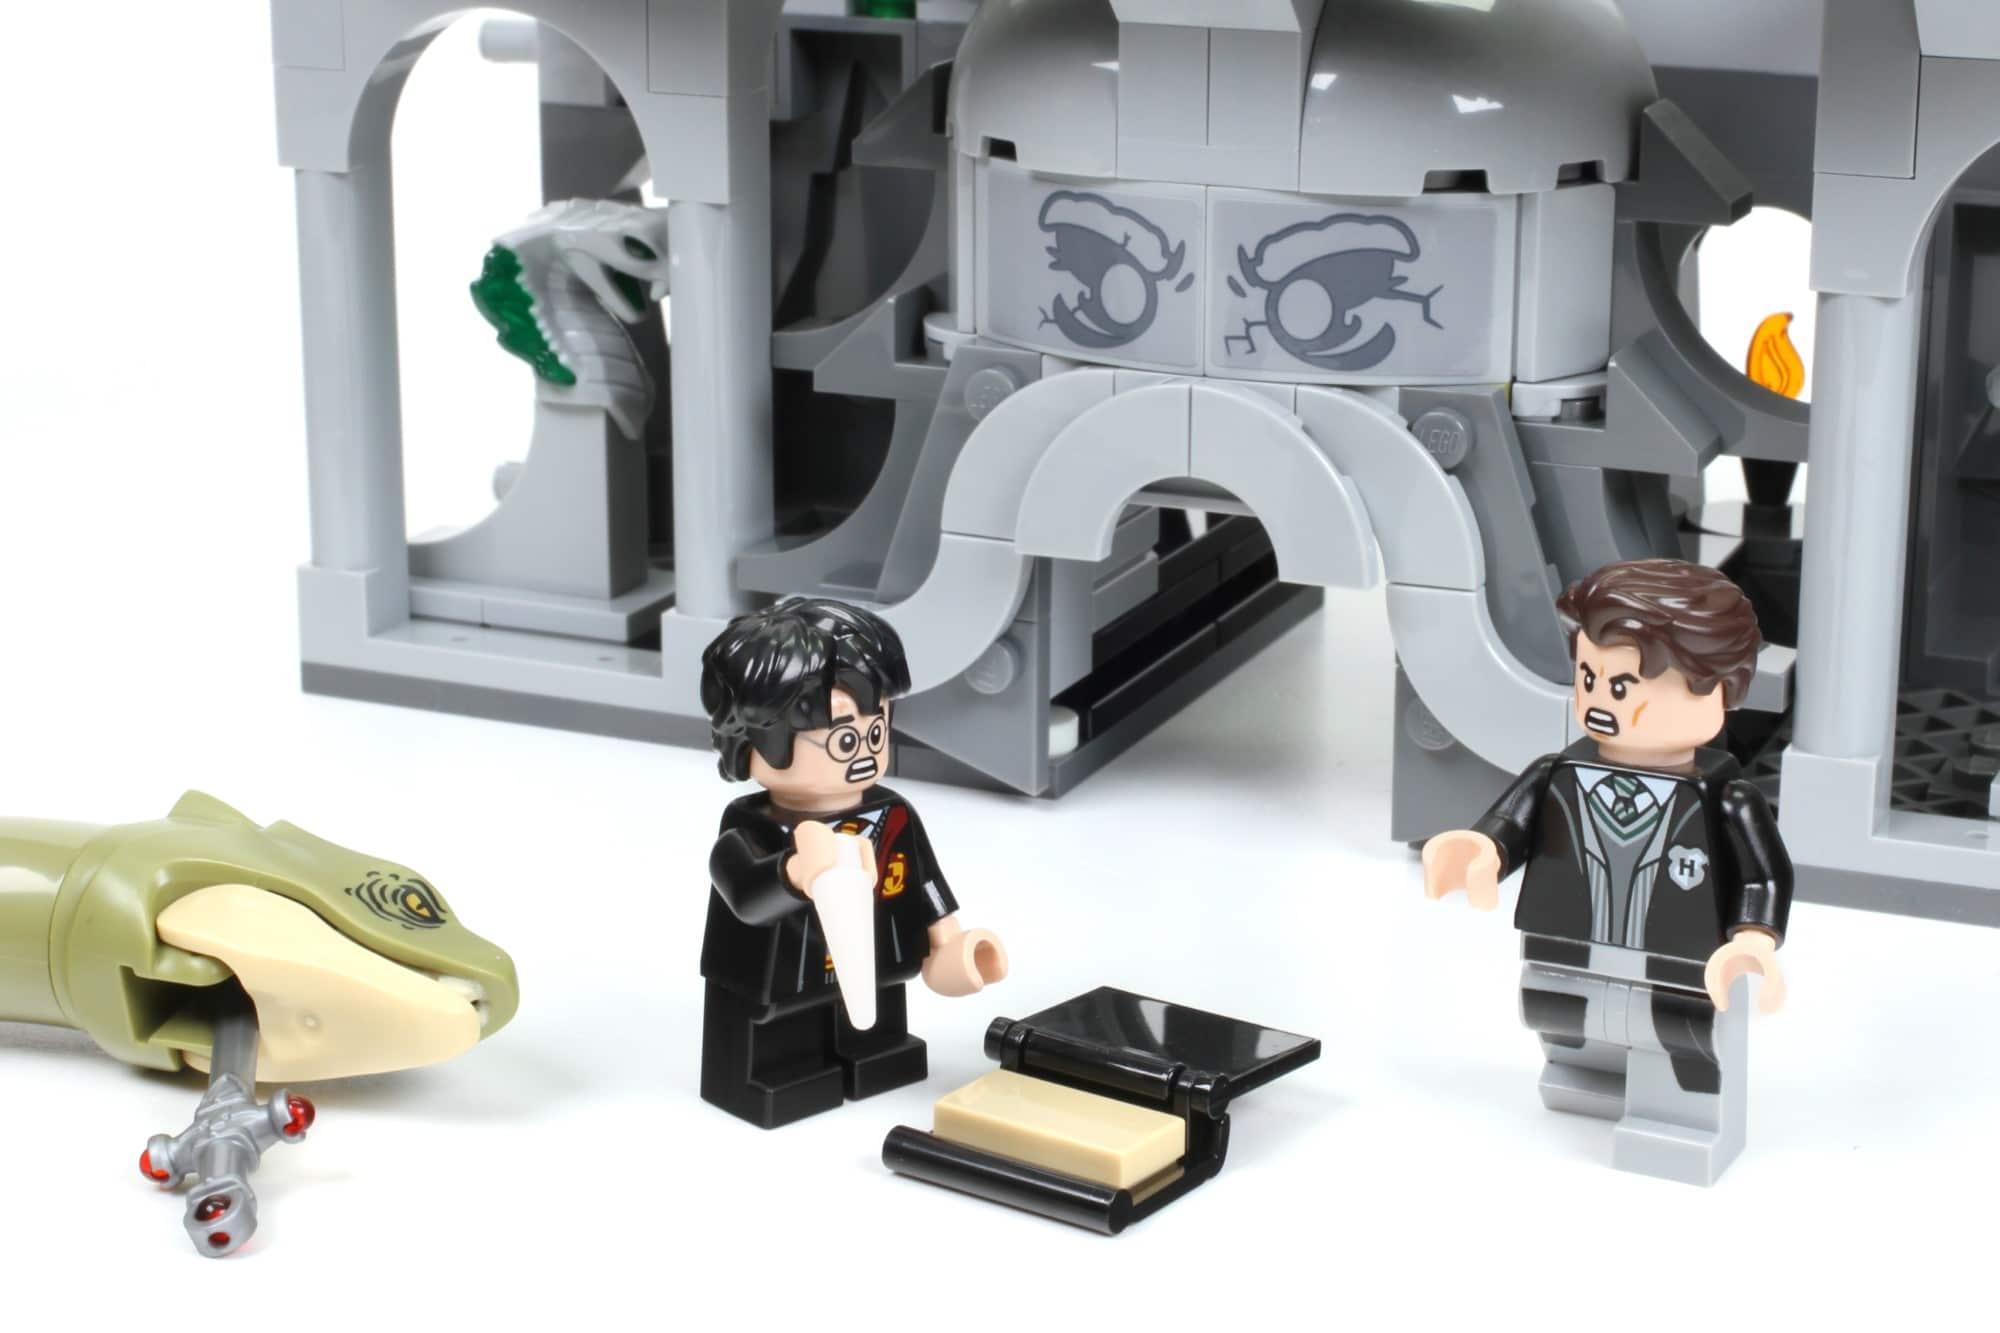 LEGO Harry Potter 76389 Hogwarts Kammer Des Schreckens Schritt 9 7